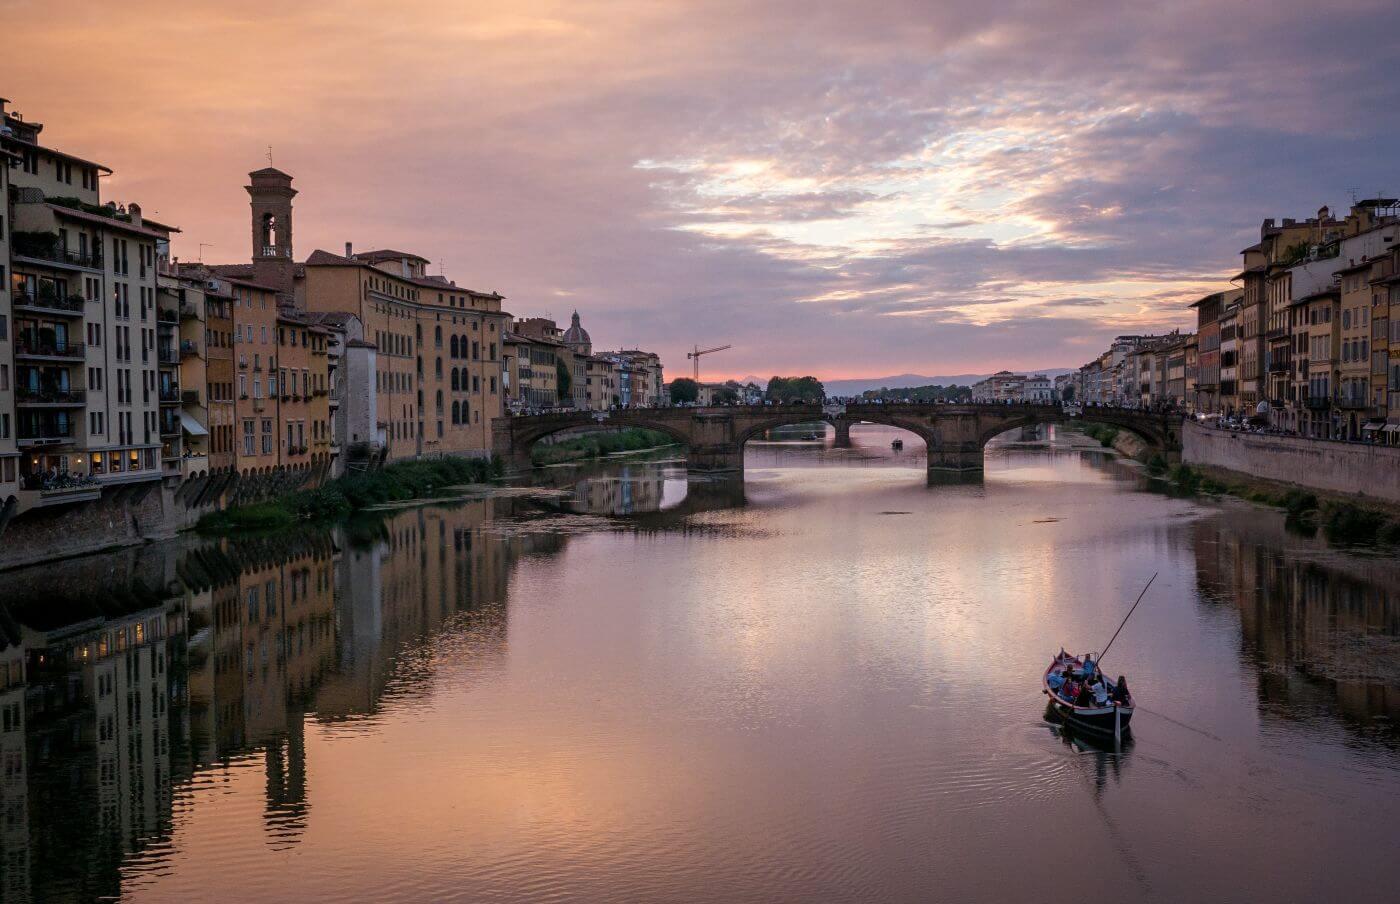 Dobrou noc Brno, dobré ráno Florencie